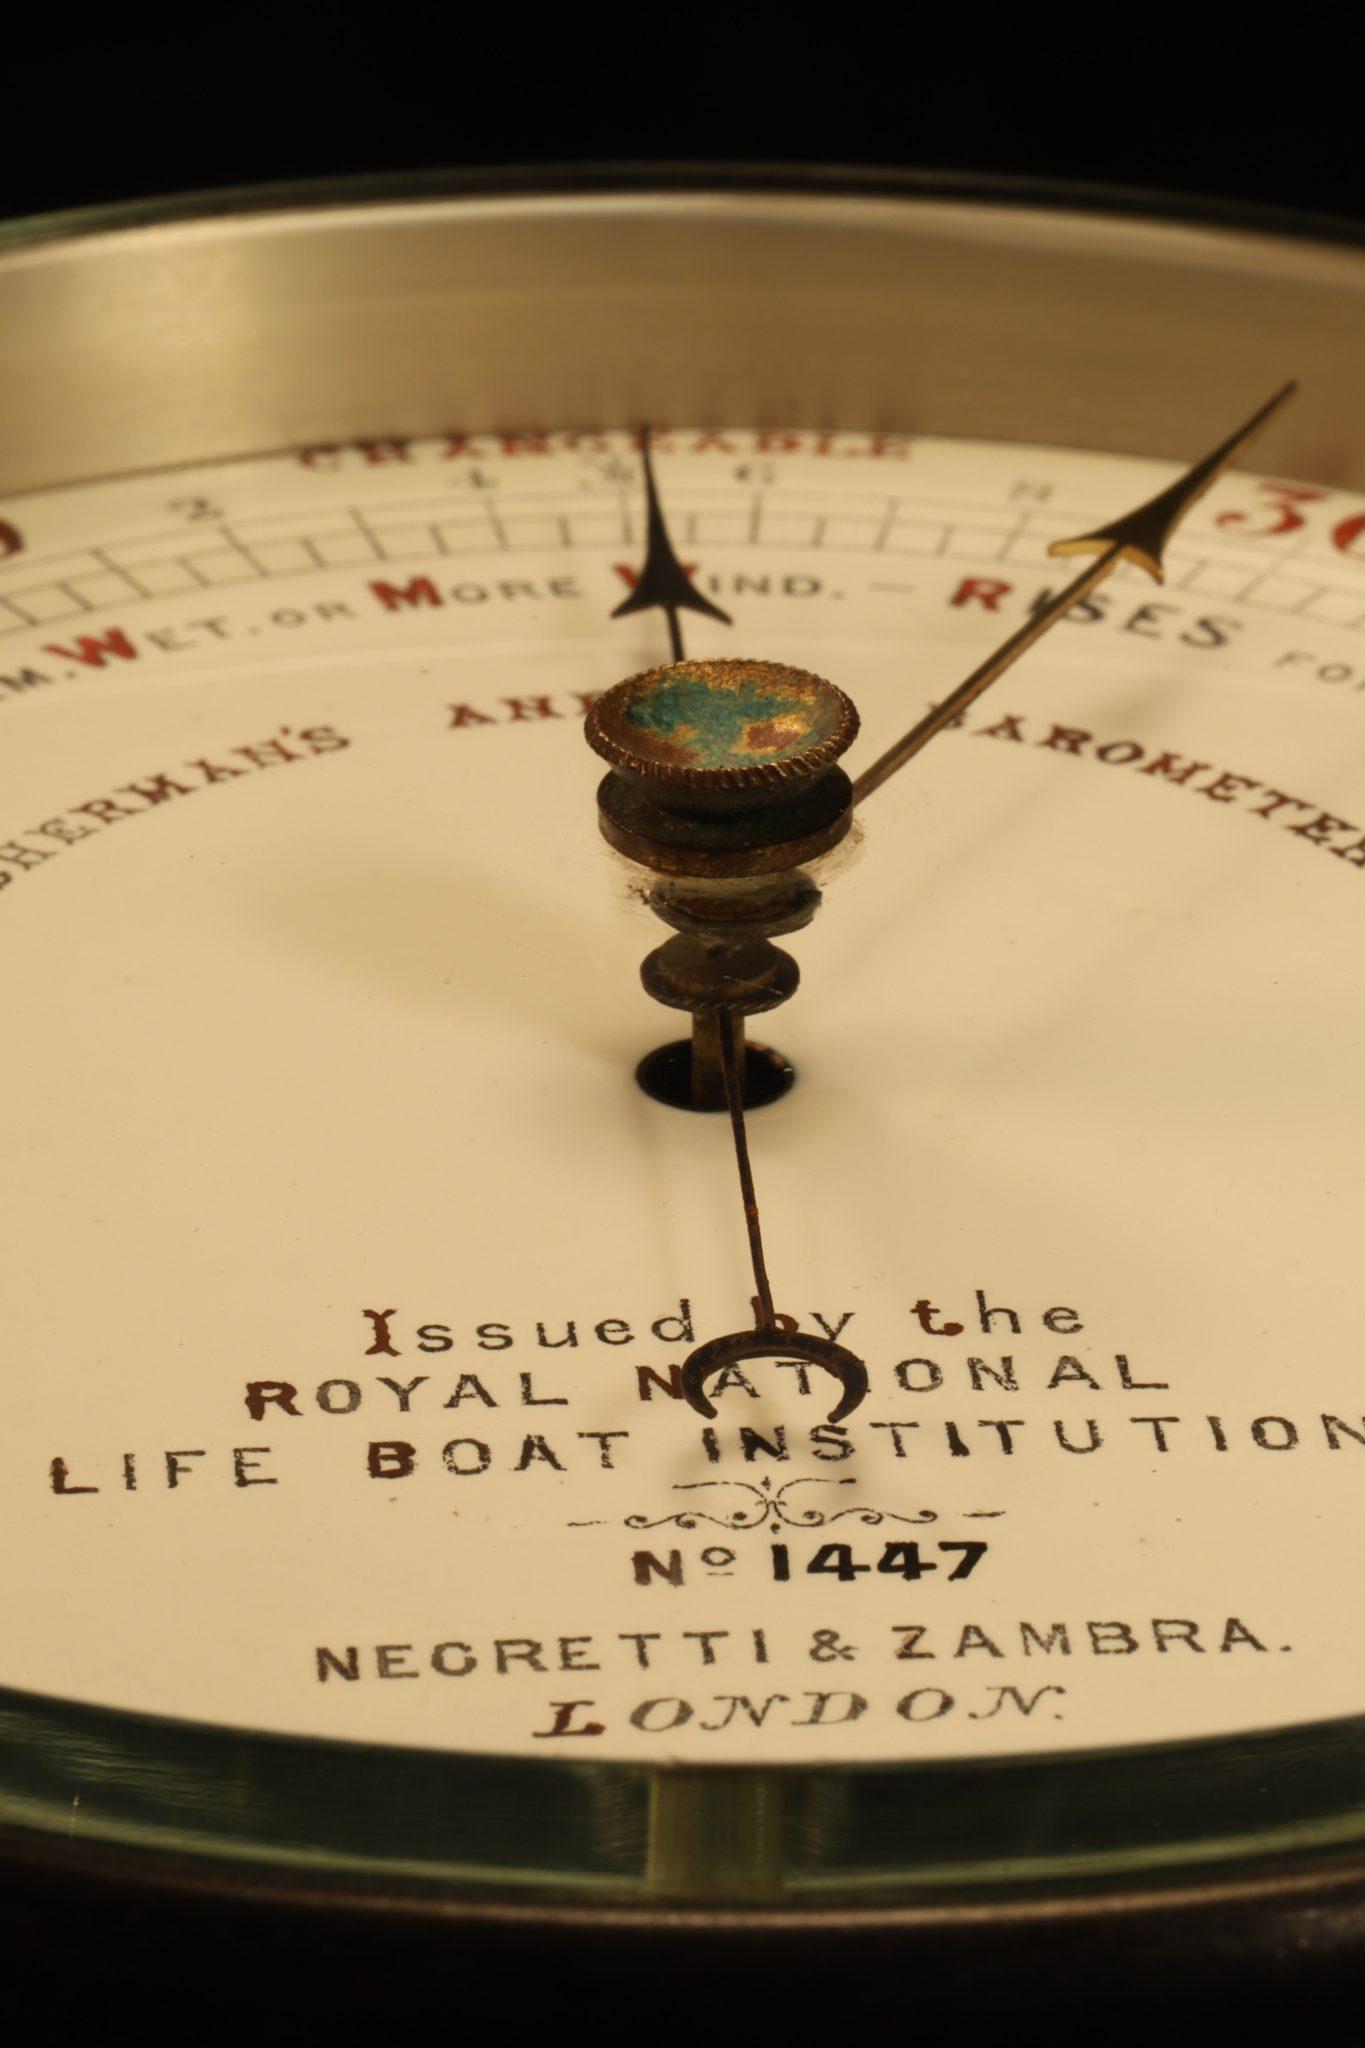 Image of Negretti & Zambra RNLI Barometer No 1447